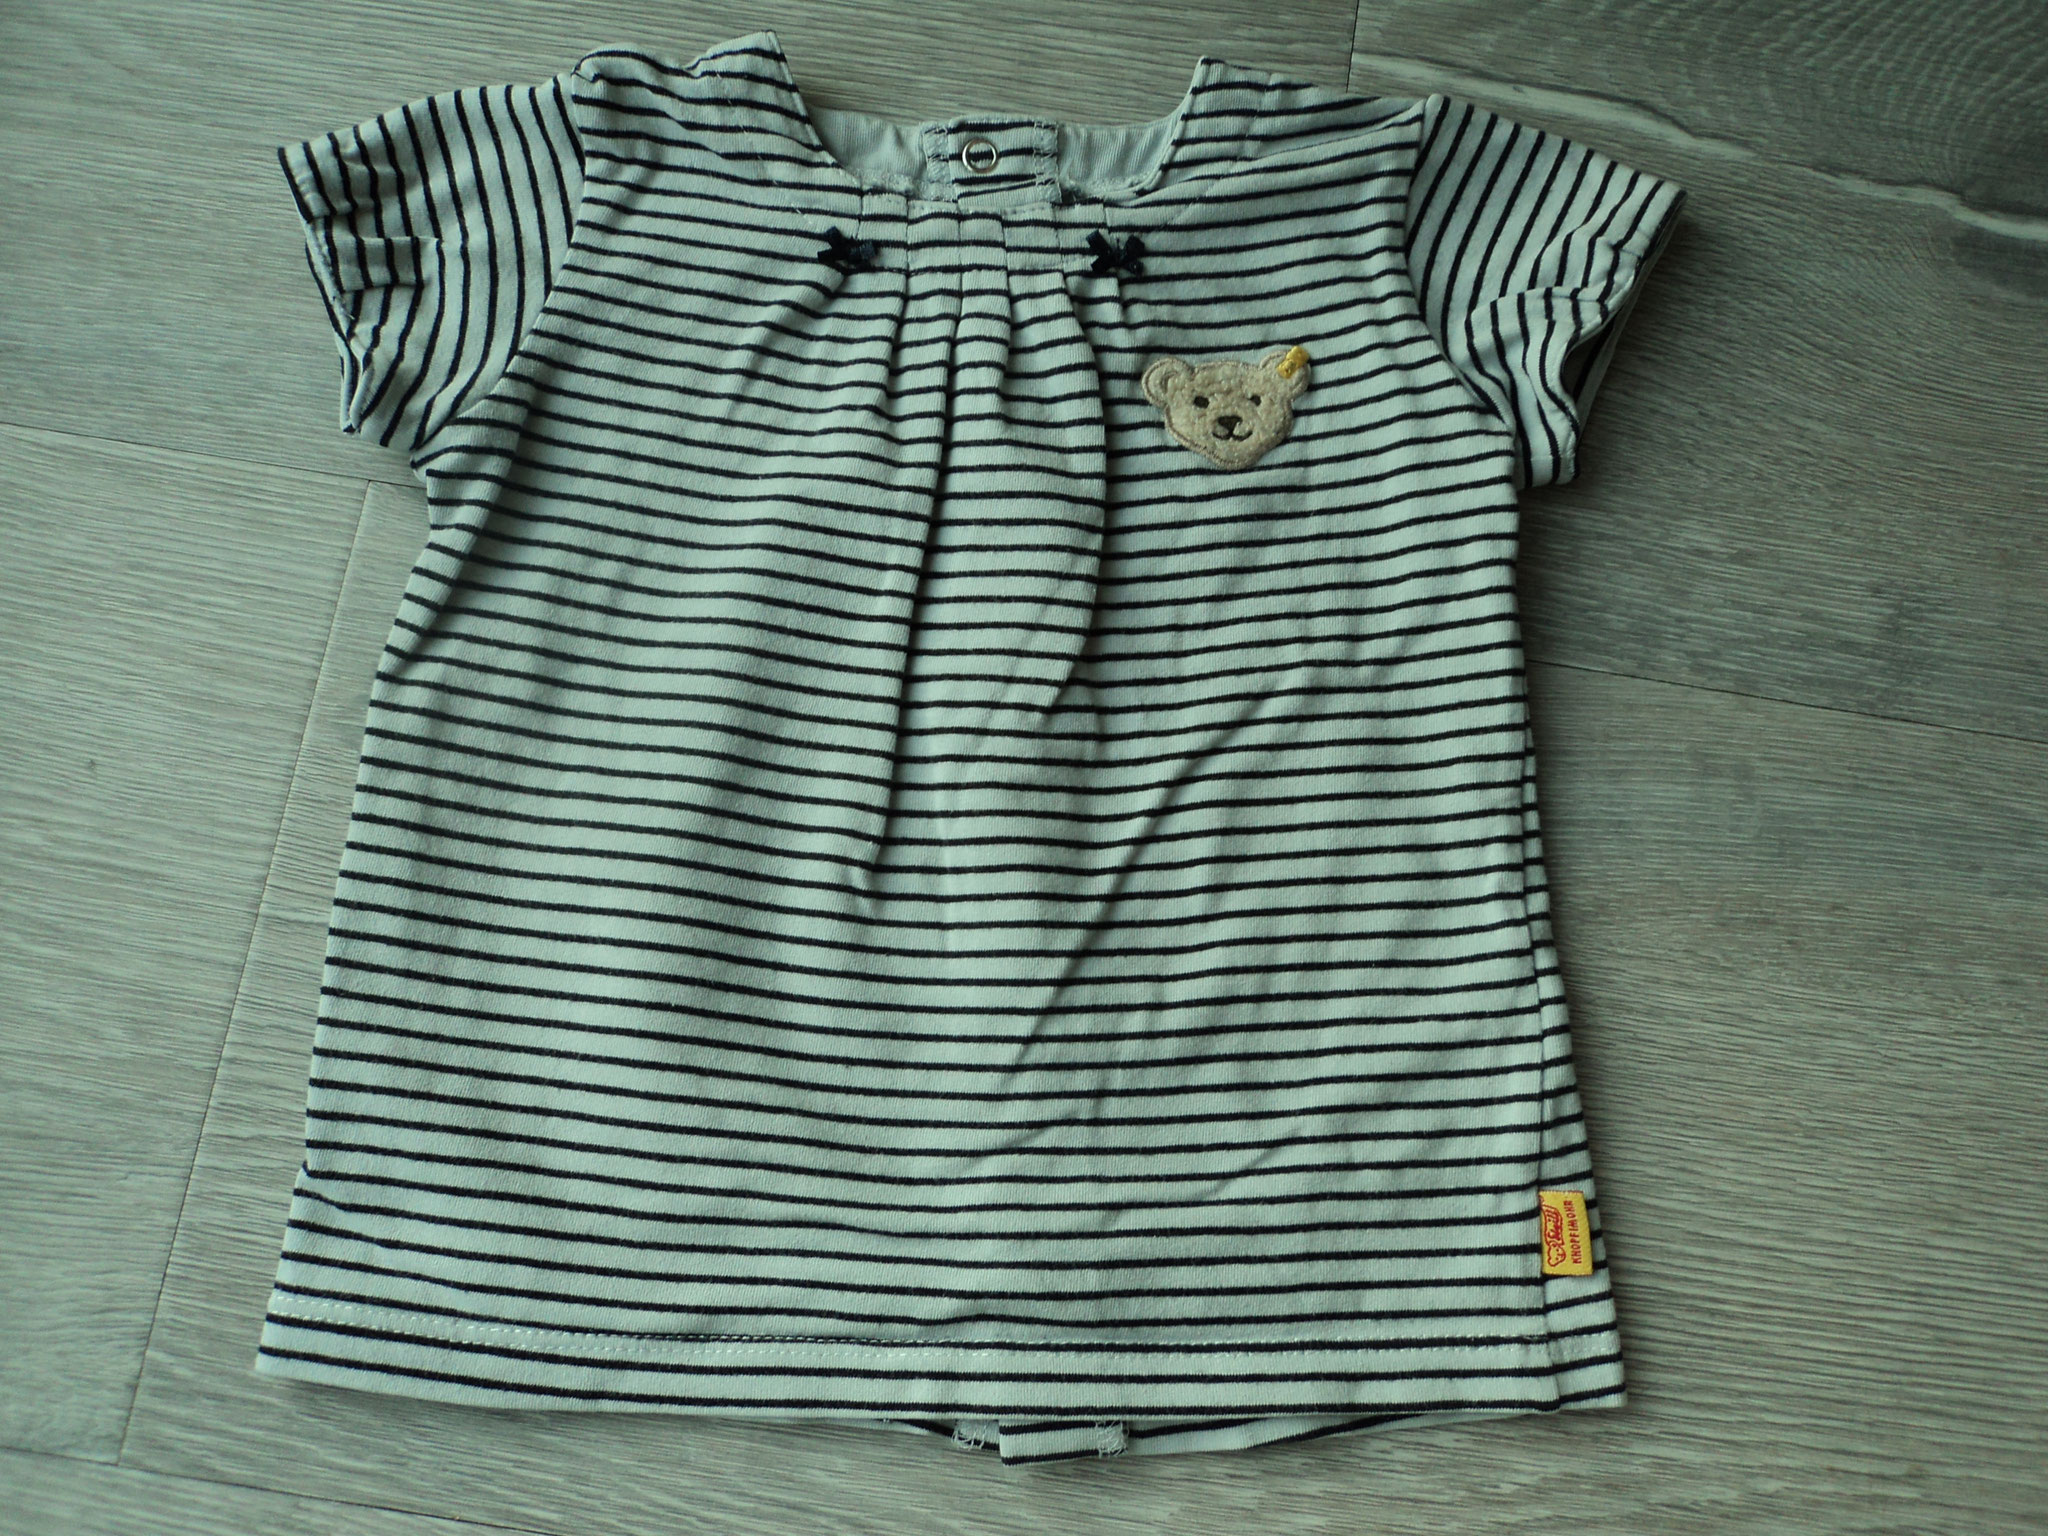 Steiff Shirt